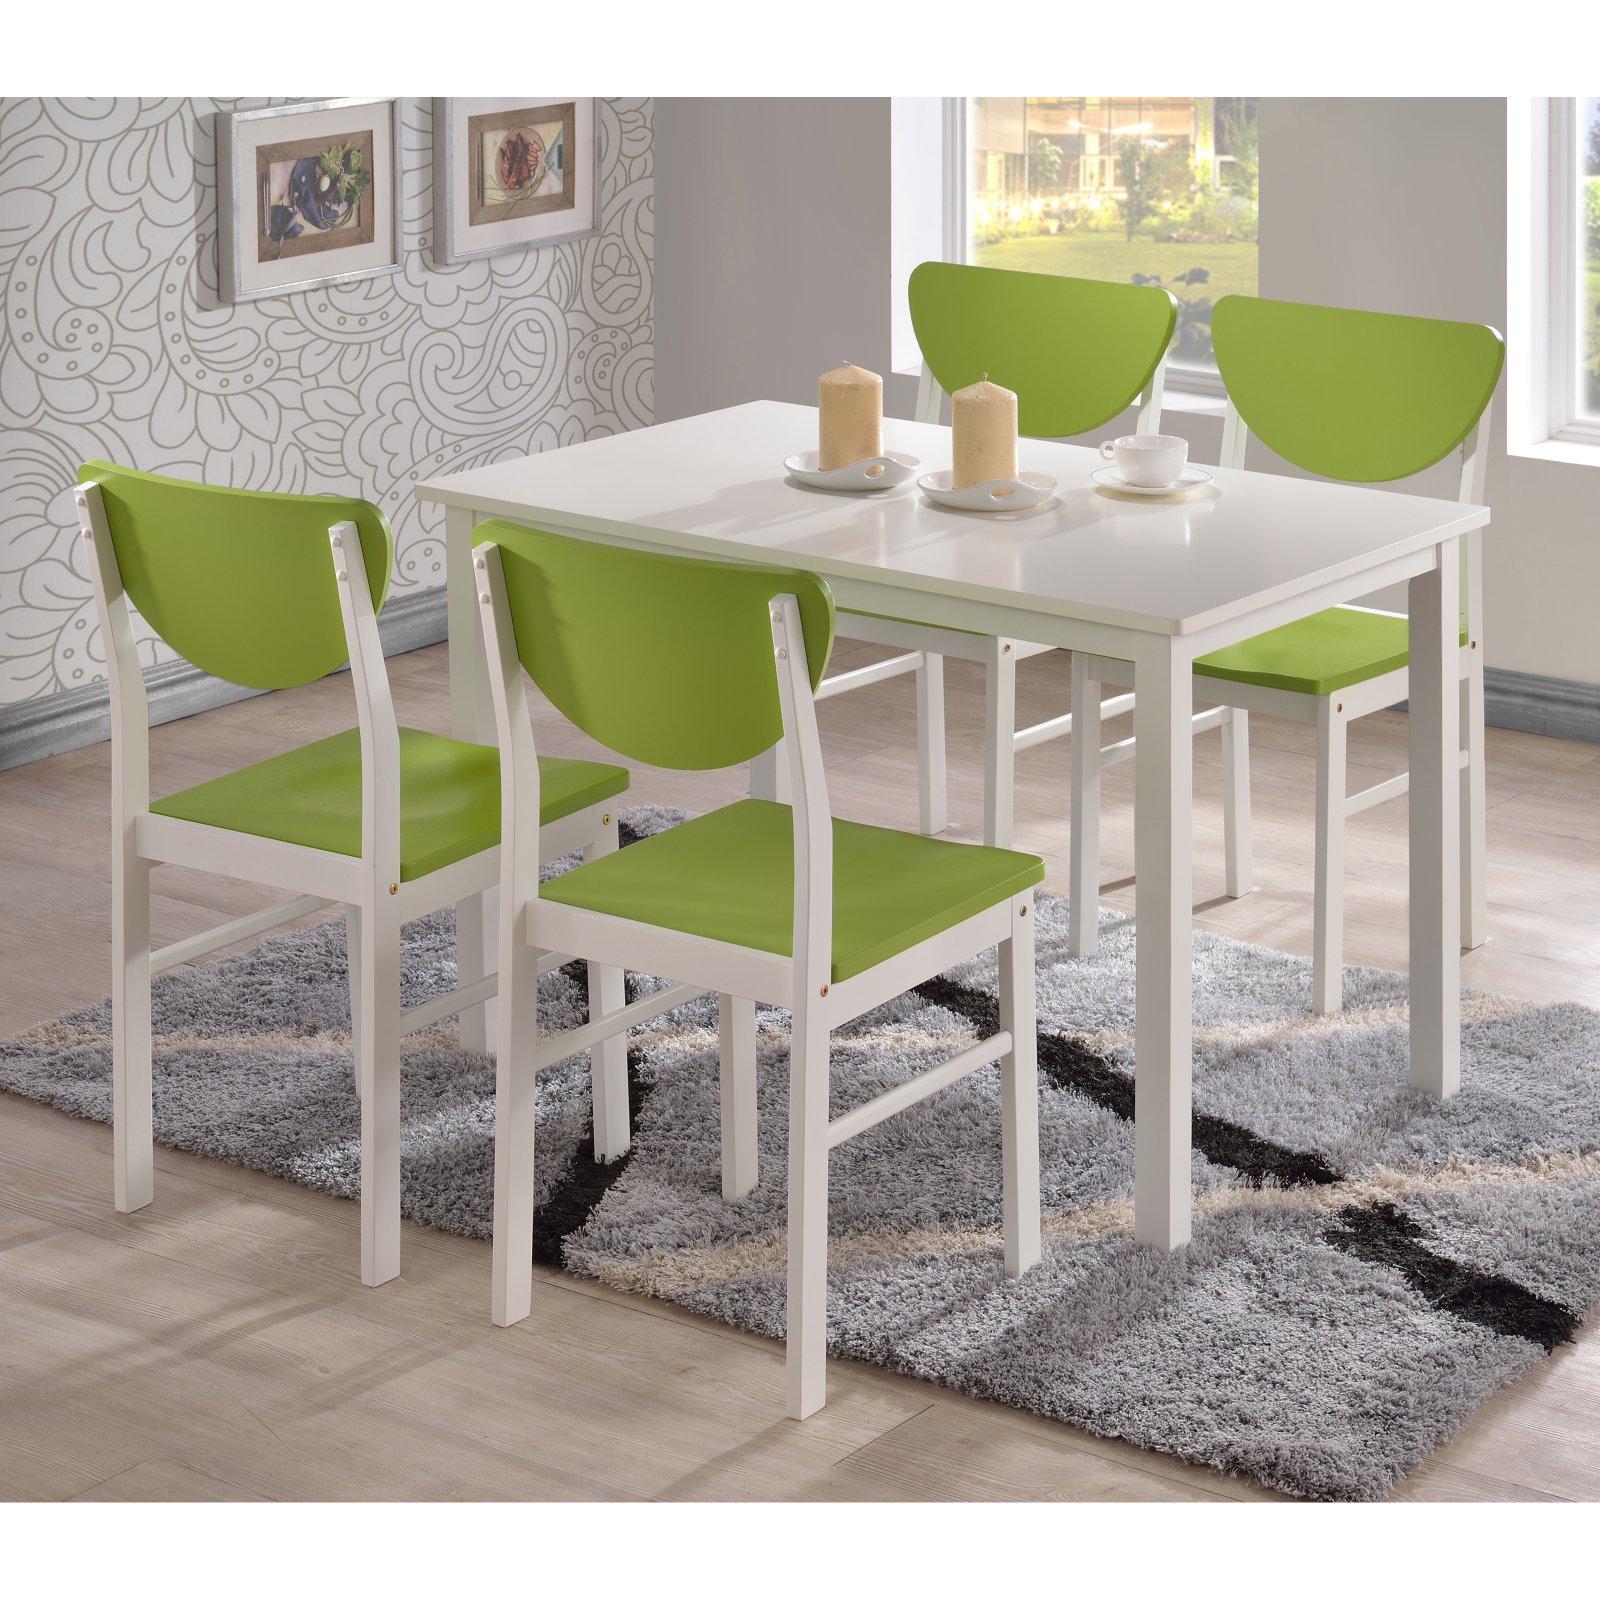 K & B Furniture Rutland Dining Table - White